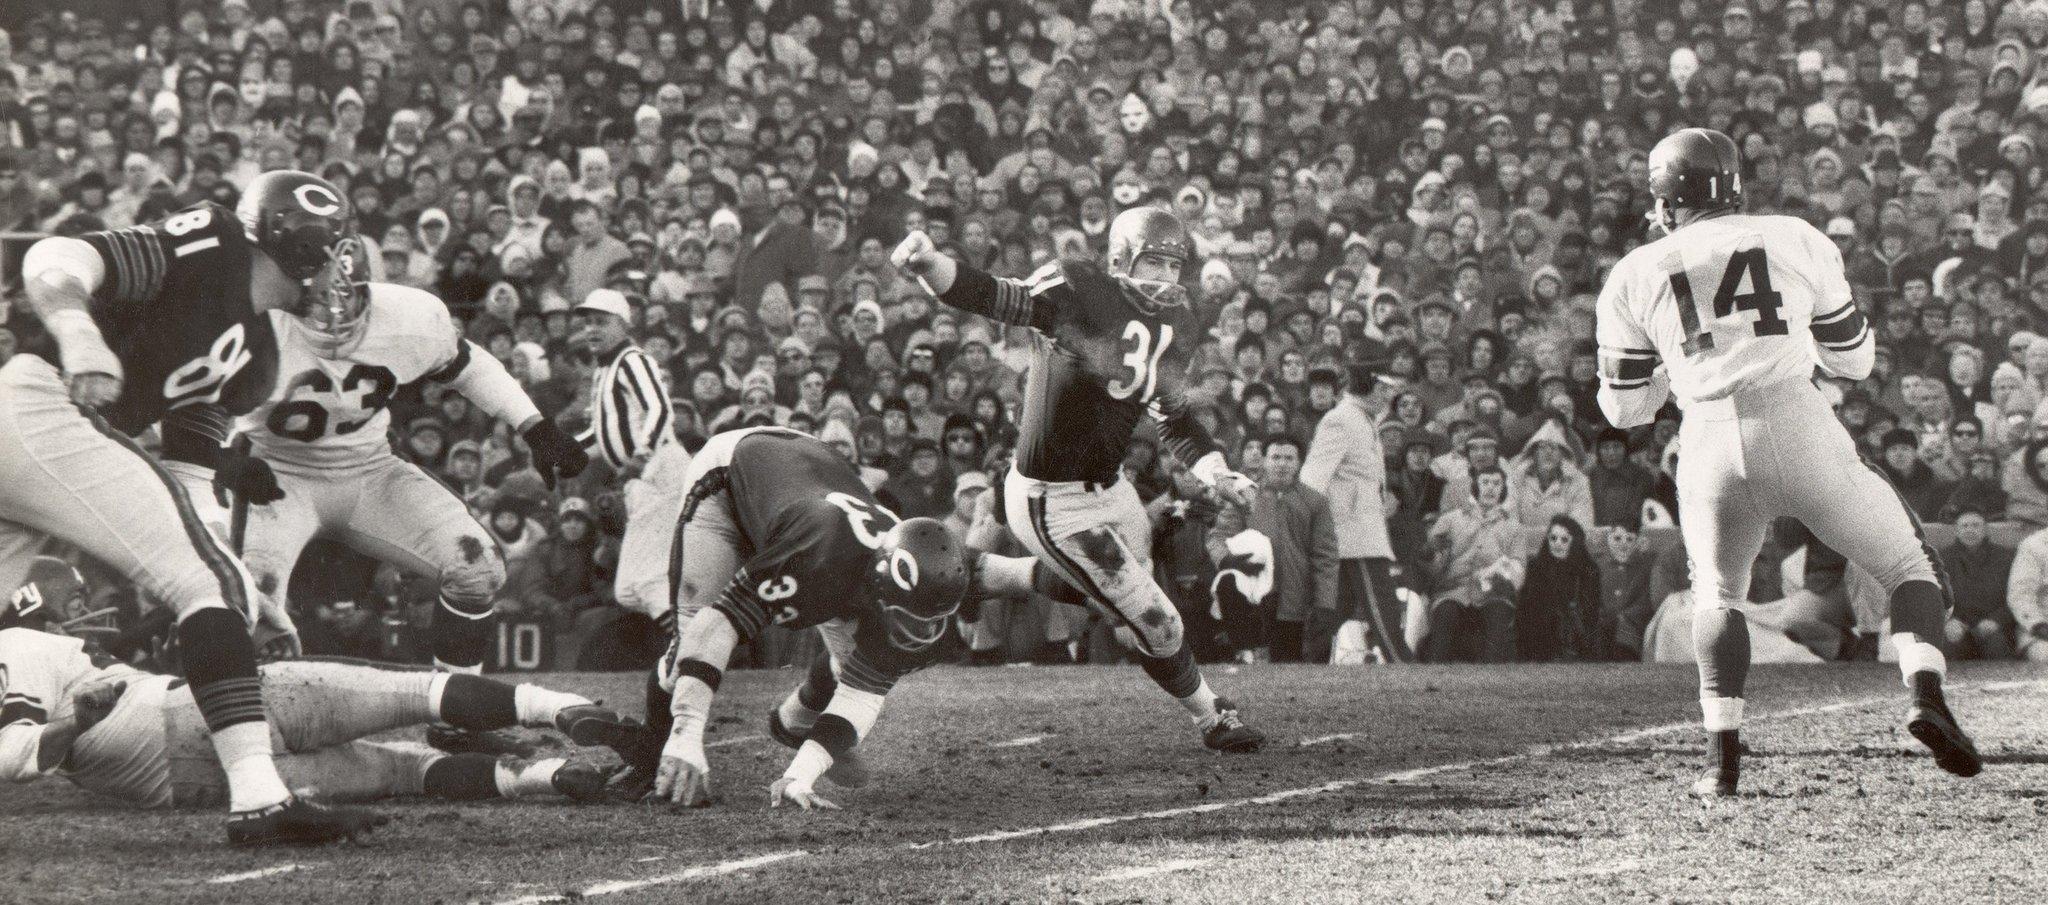 Larry Morris 63 Title Game Star Dies At 79